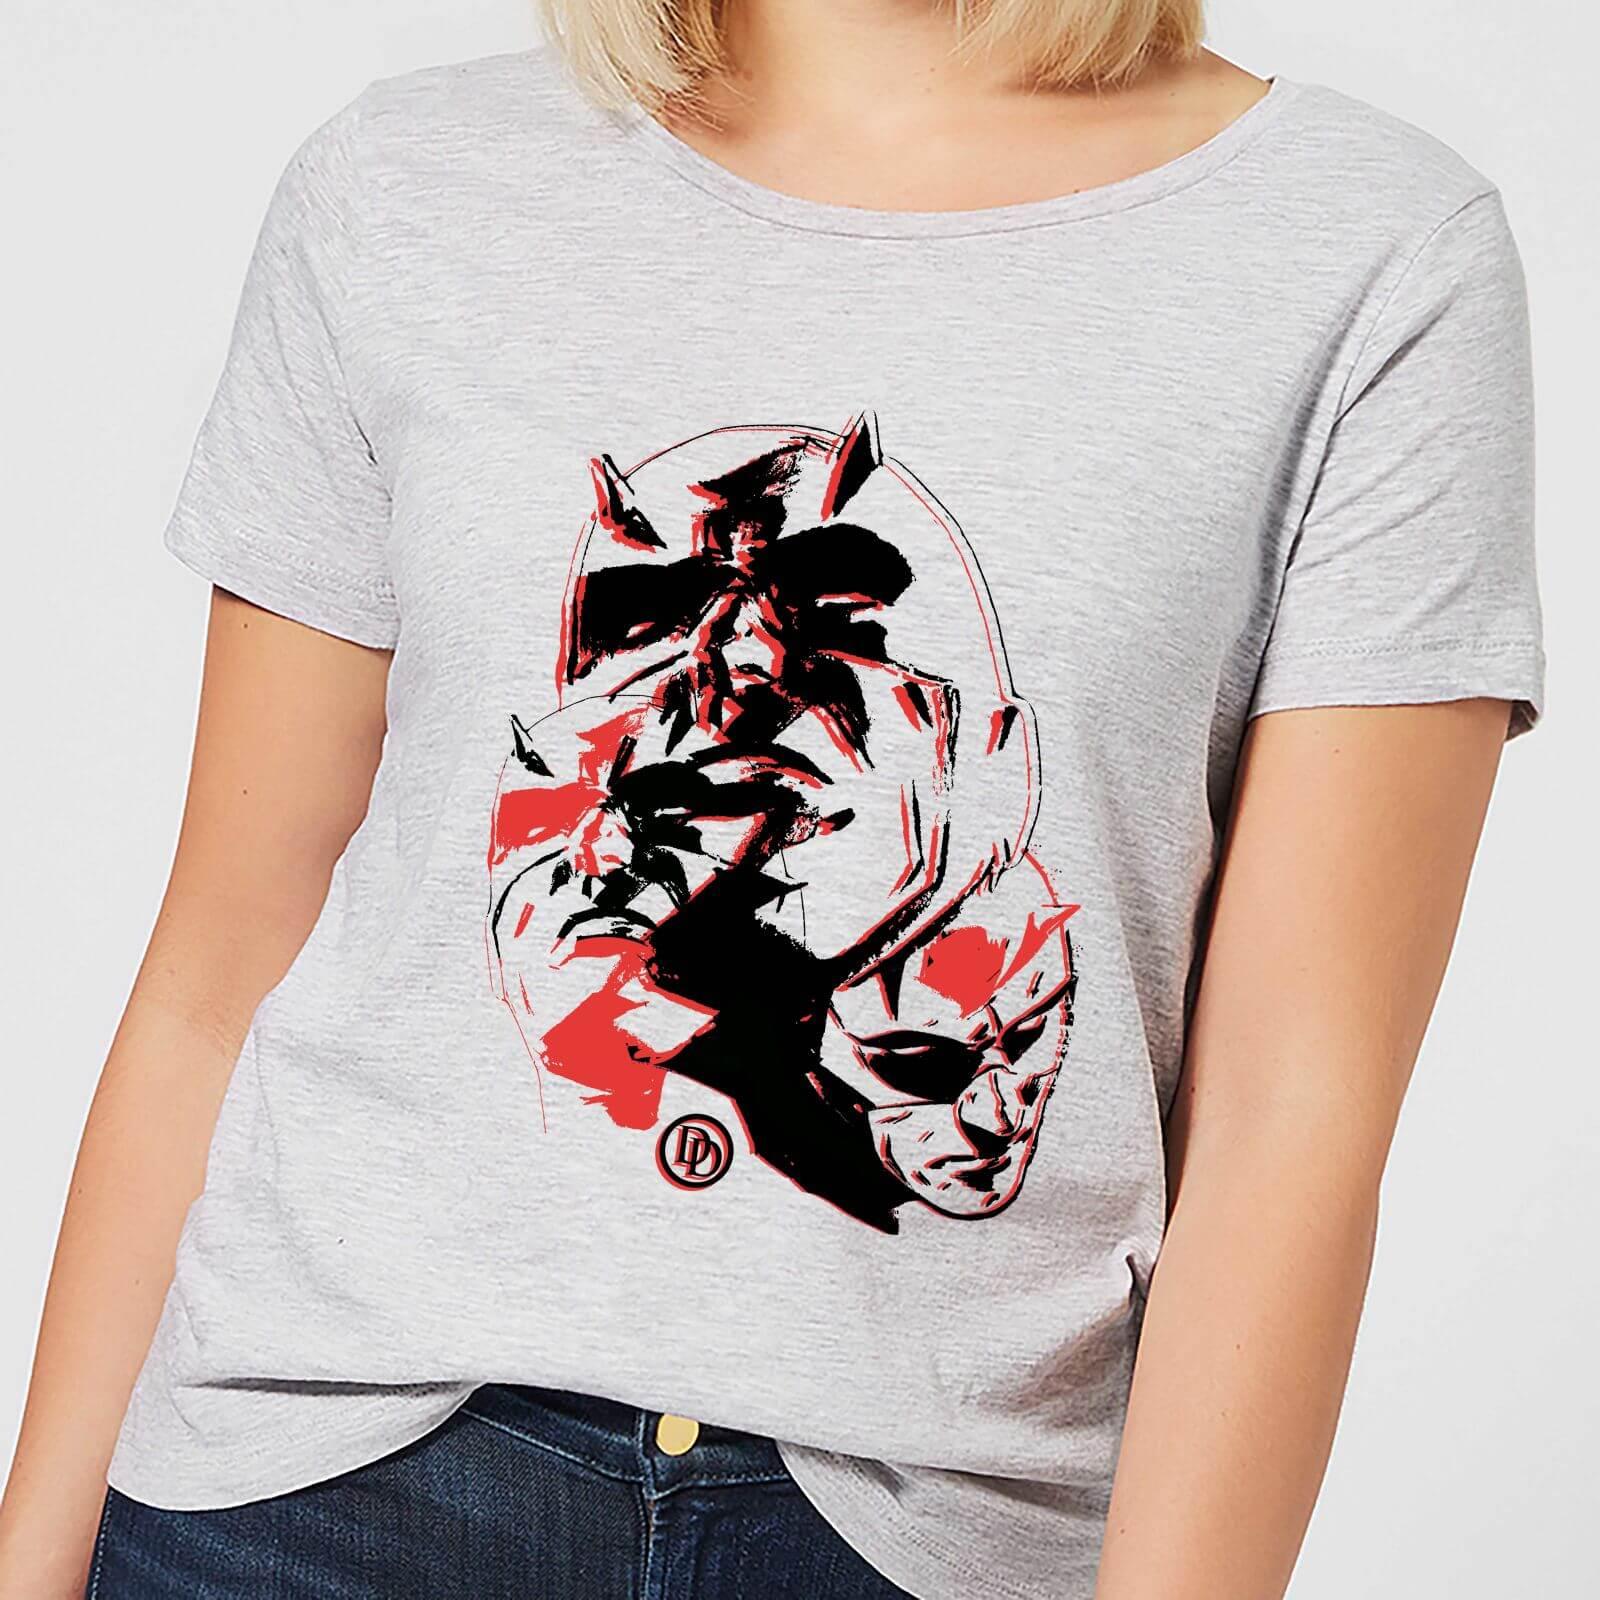 OfferteWeb.click 81-t-shirt-marvel-knights-daredevil-layered-faces-grigio